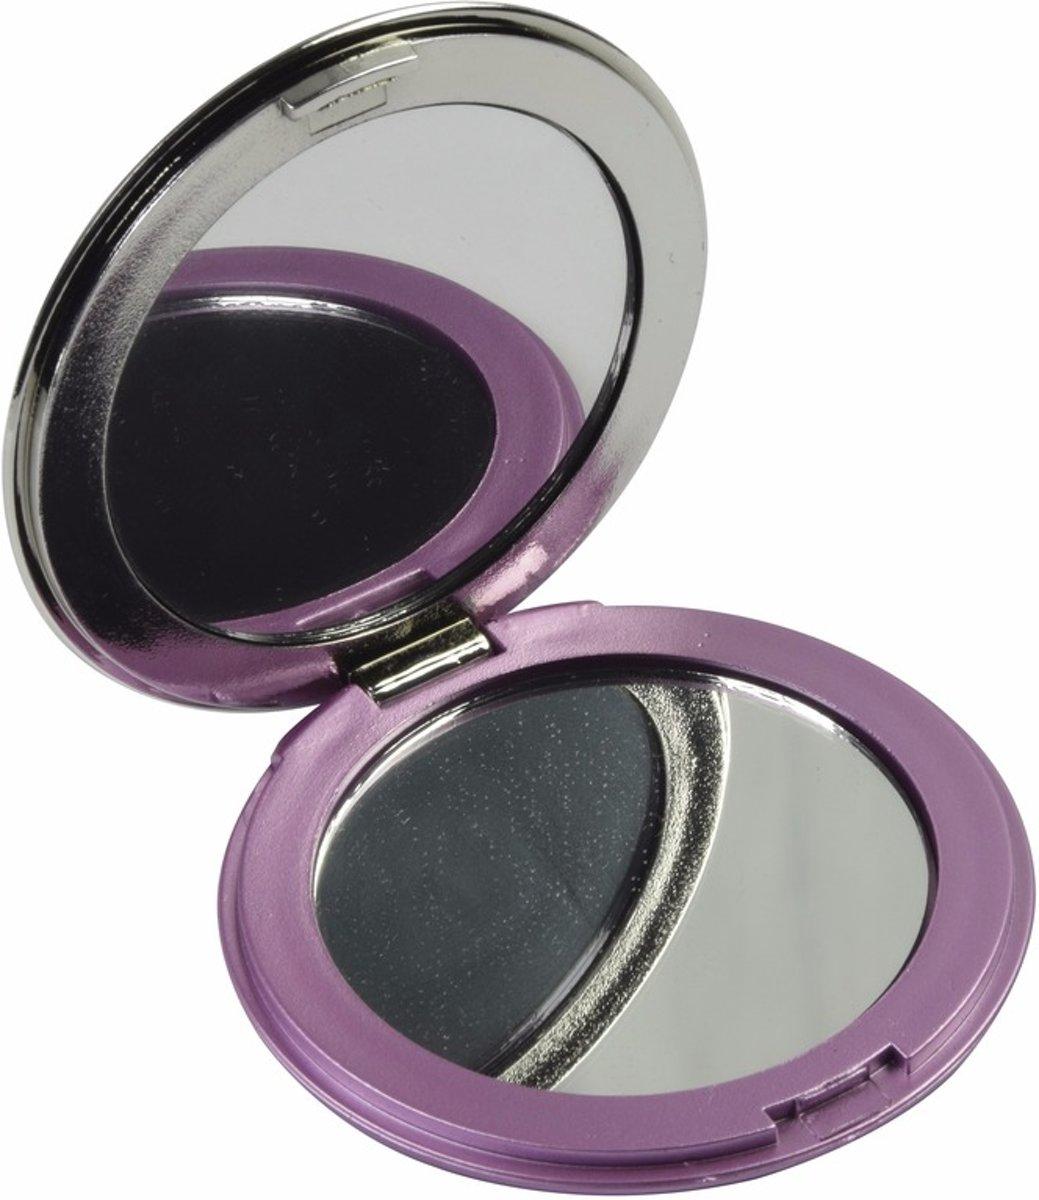 Zak spiegeltje roze - make up spiegel